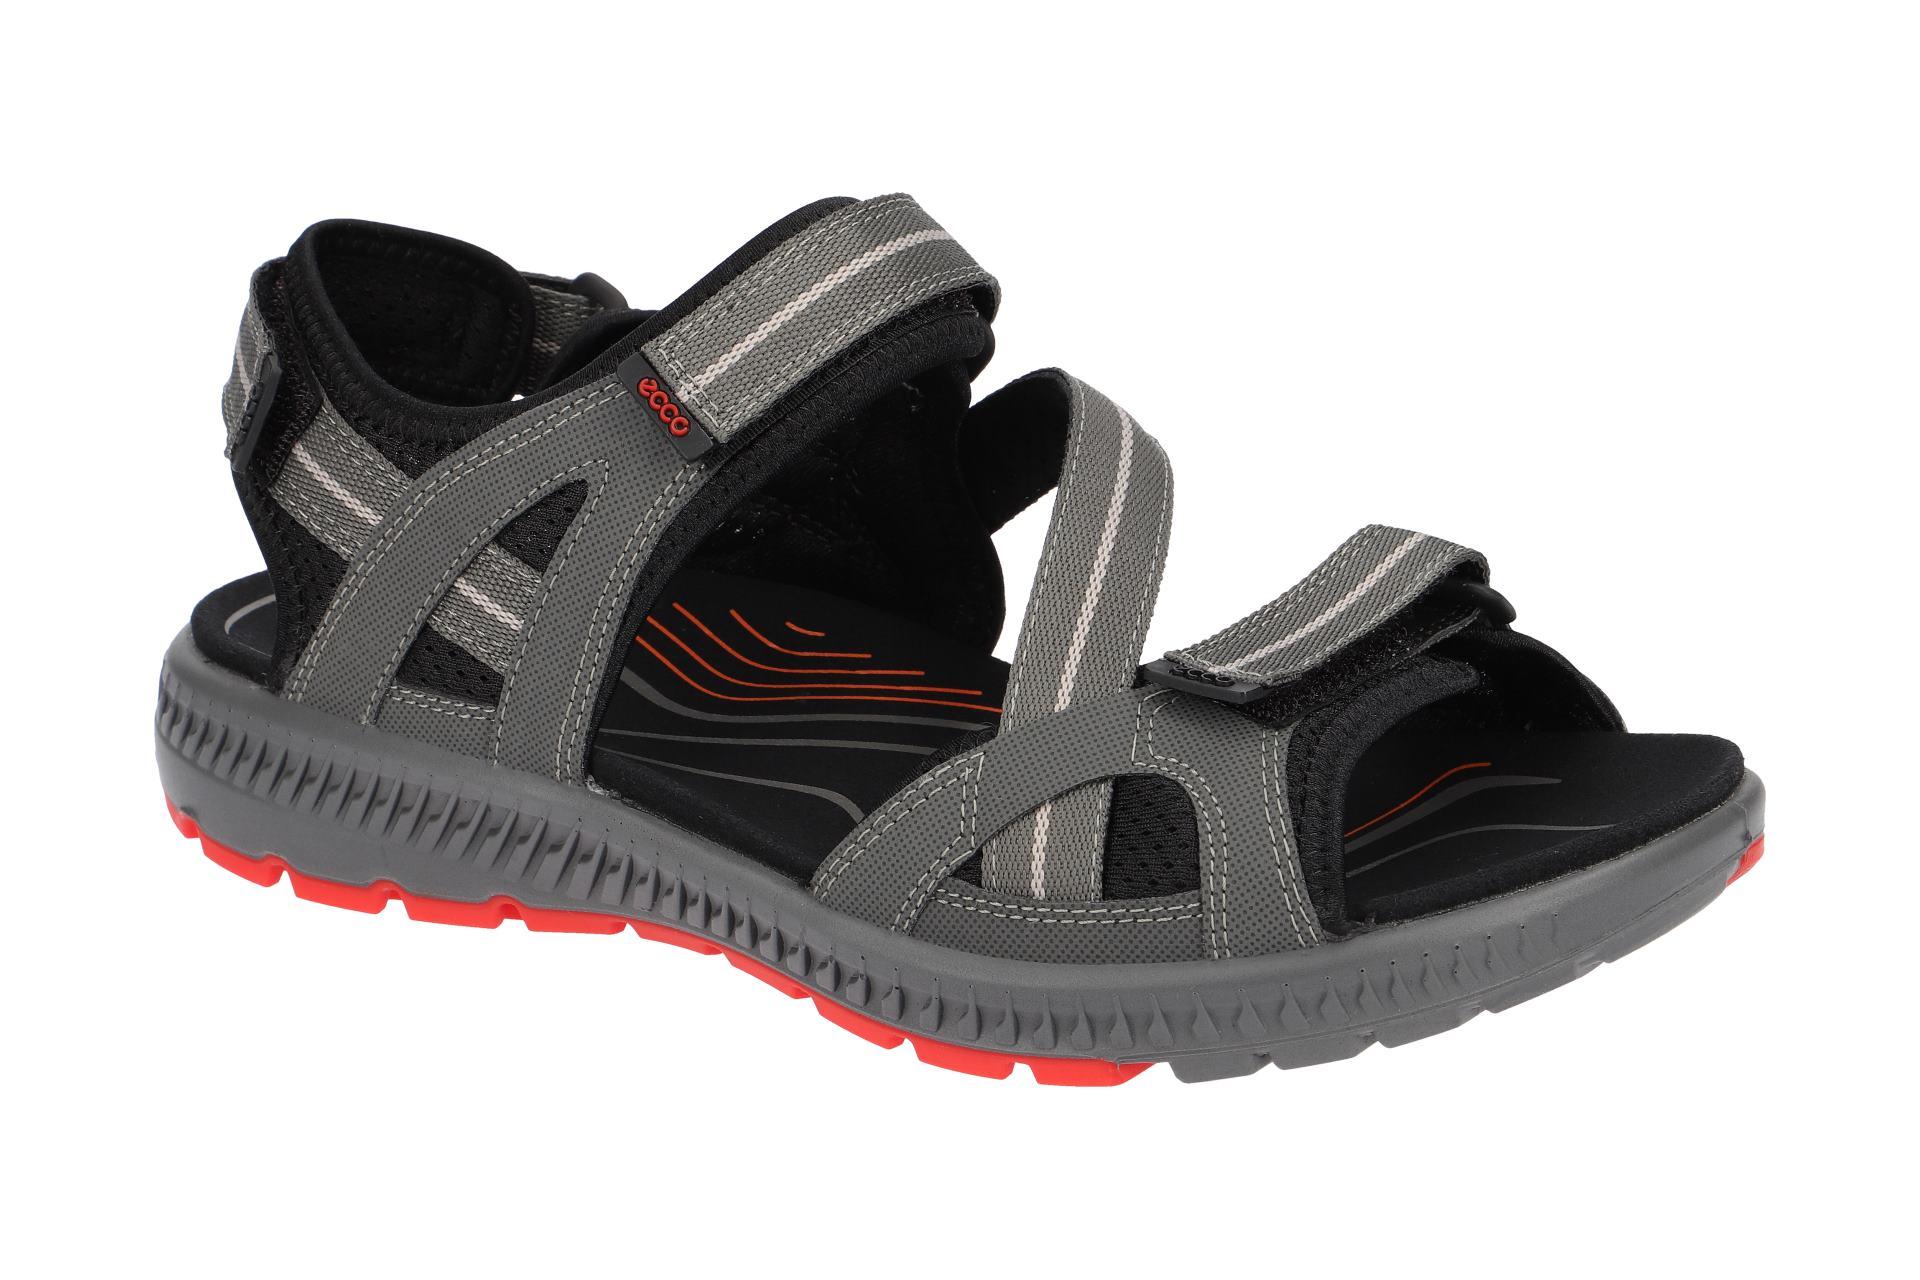 cf1ab75c46bf4e Ecco Schuhe TERRA SANDAL grau Herren Sandale Sandaletten 82271400602 ...